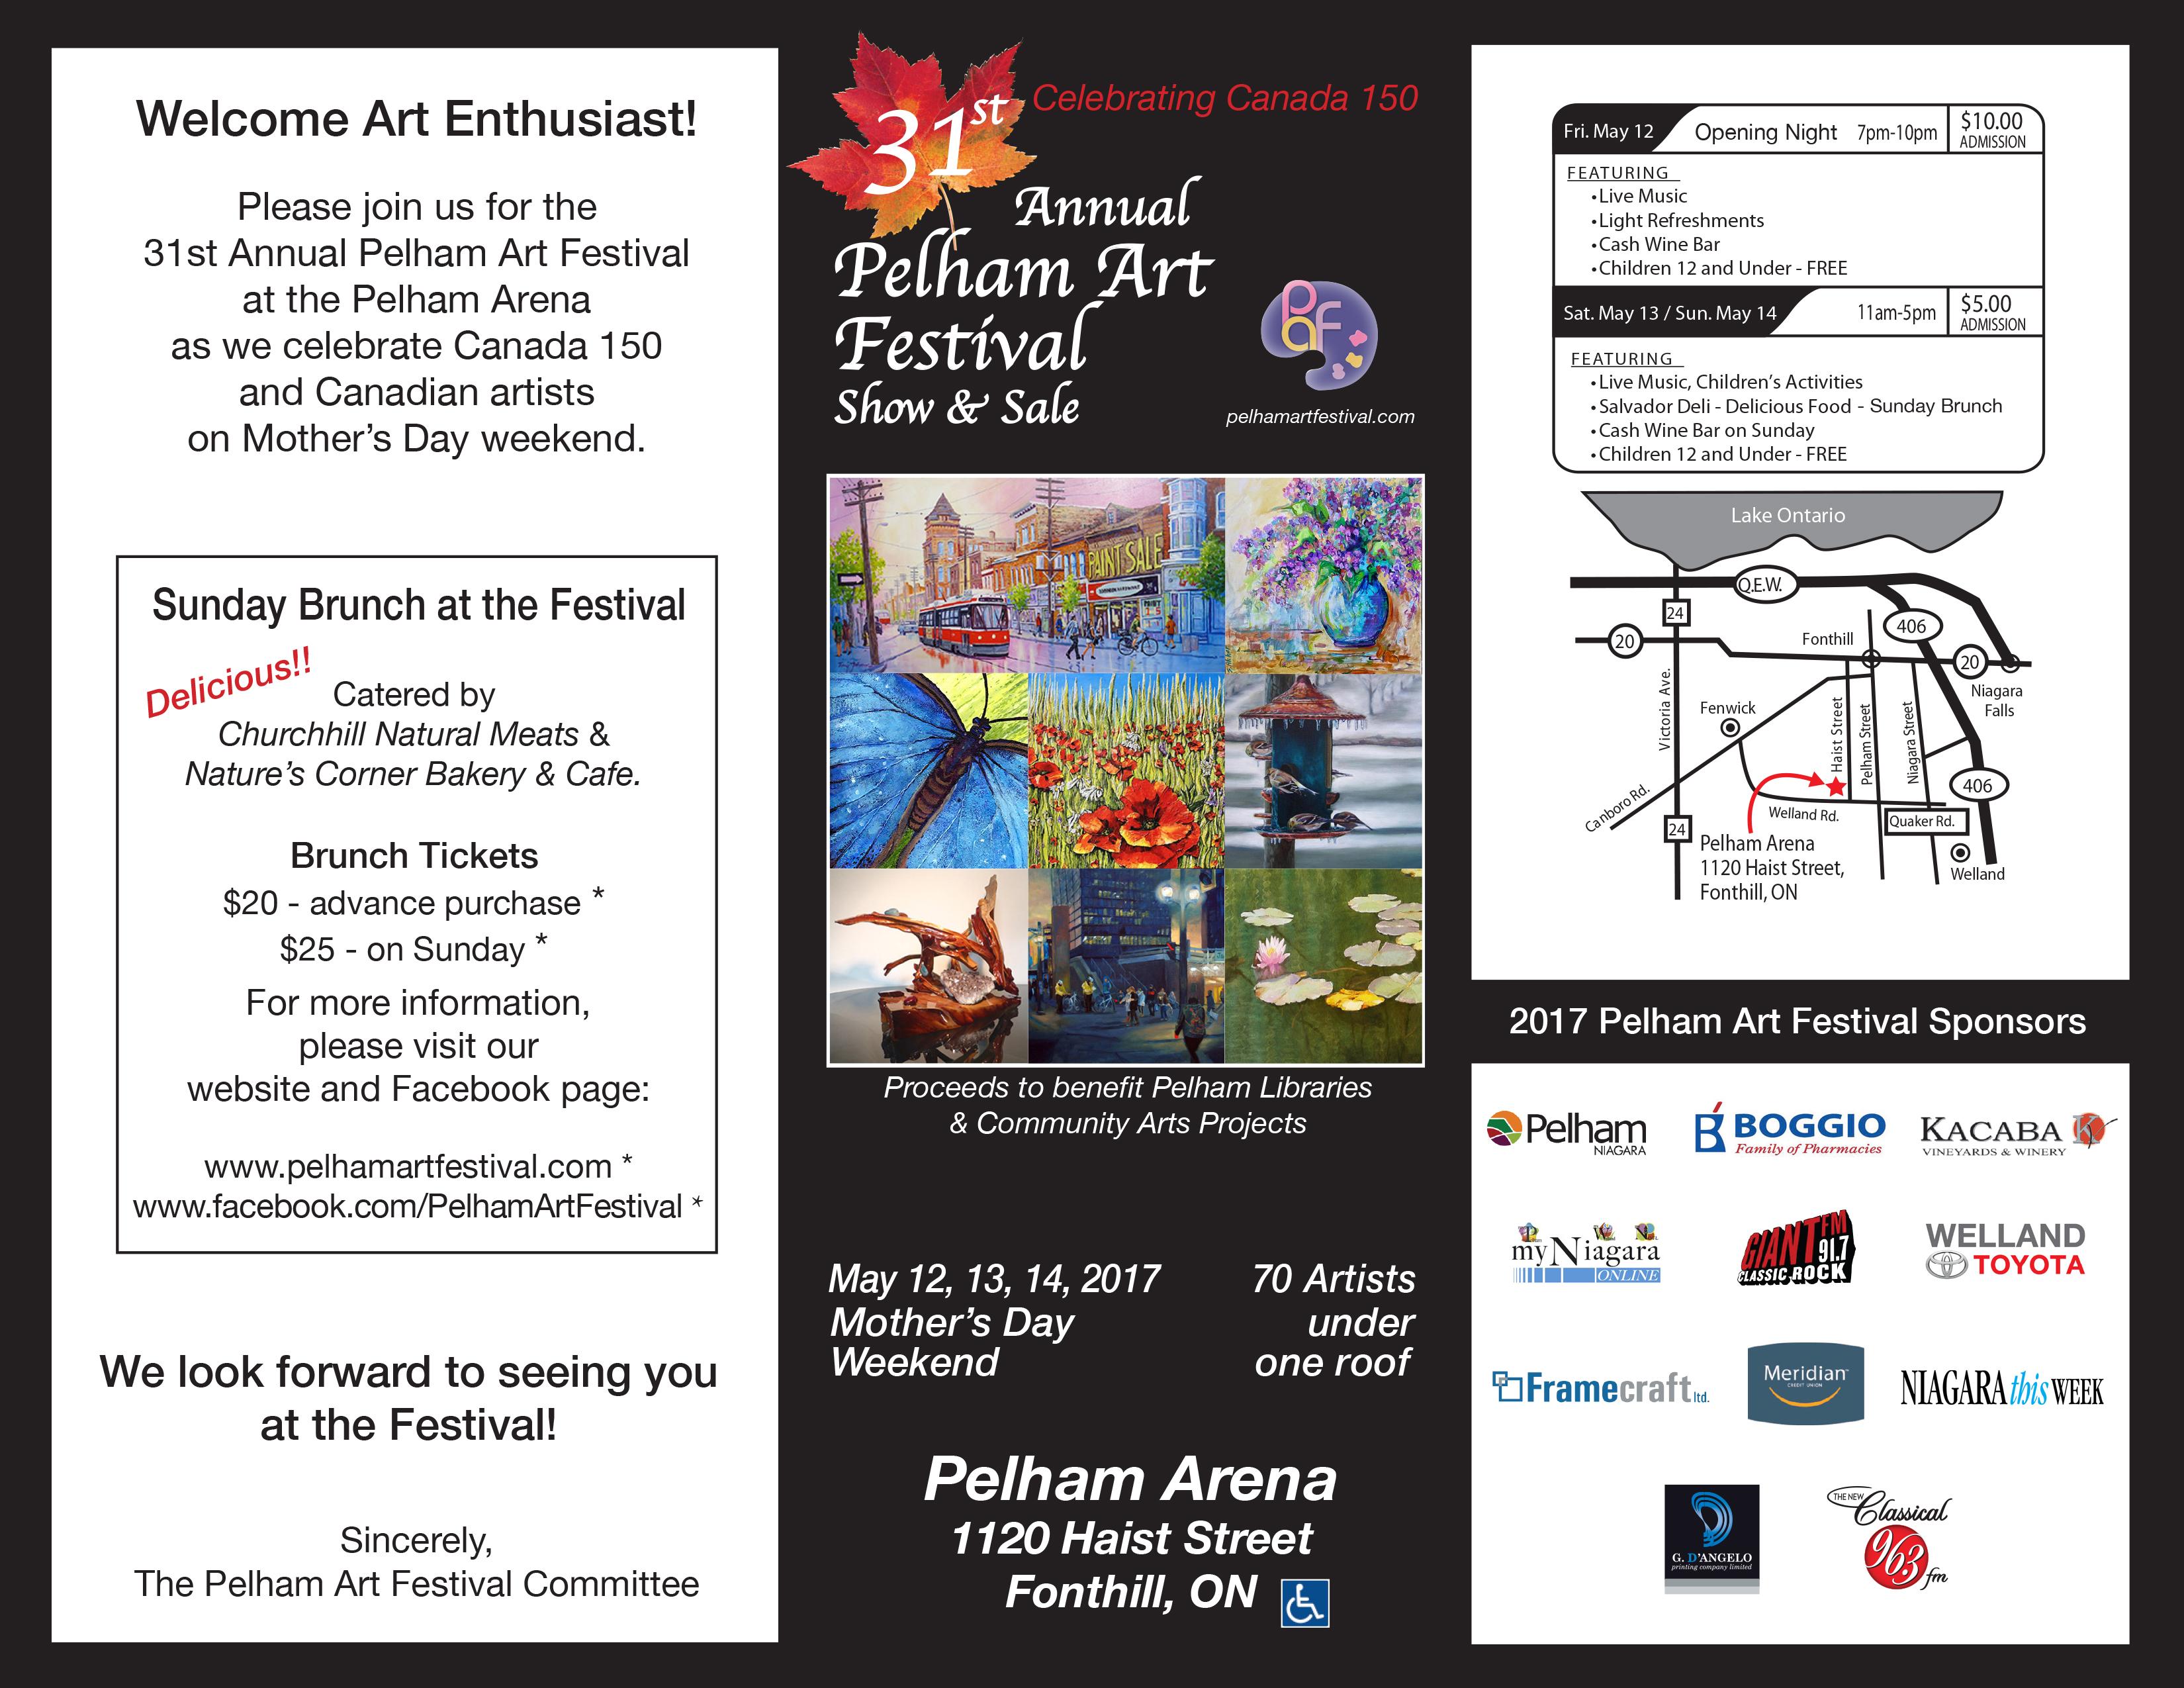 Invitation to the 2017 Pelham Art Festival